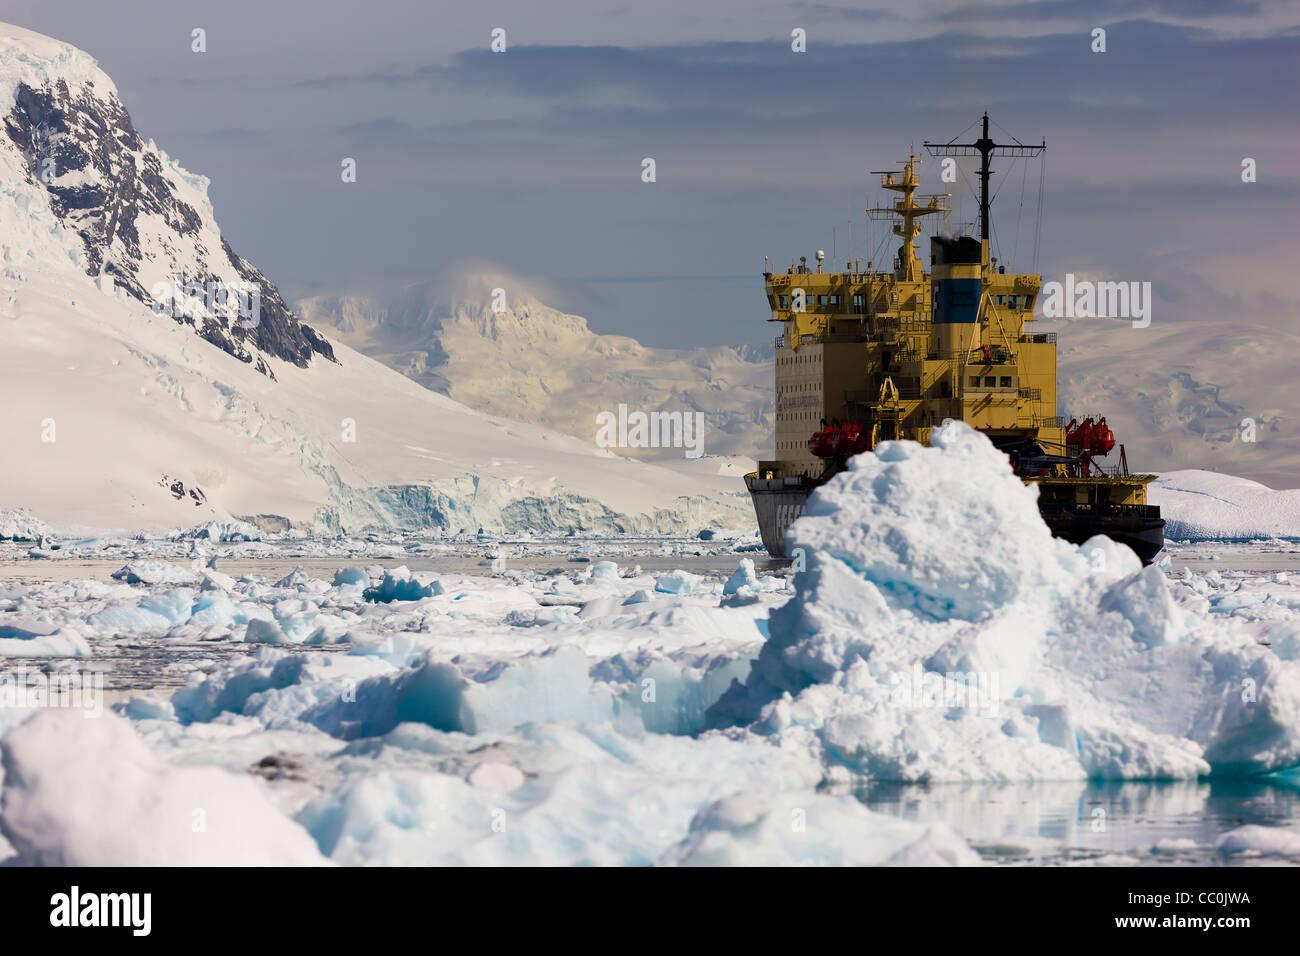 Antarctic peninsular Kapitan Khlebnikov Icebreaker moored anchored - Stock Image